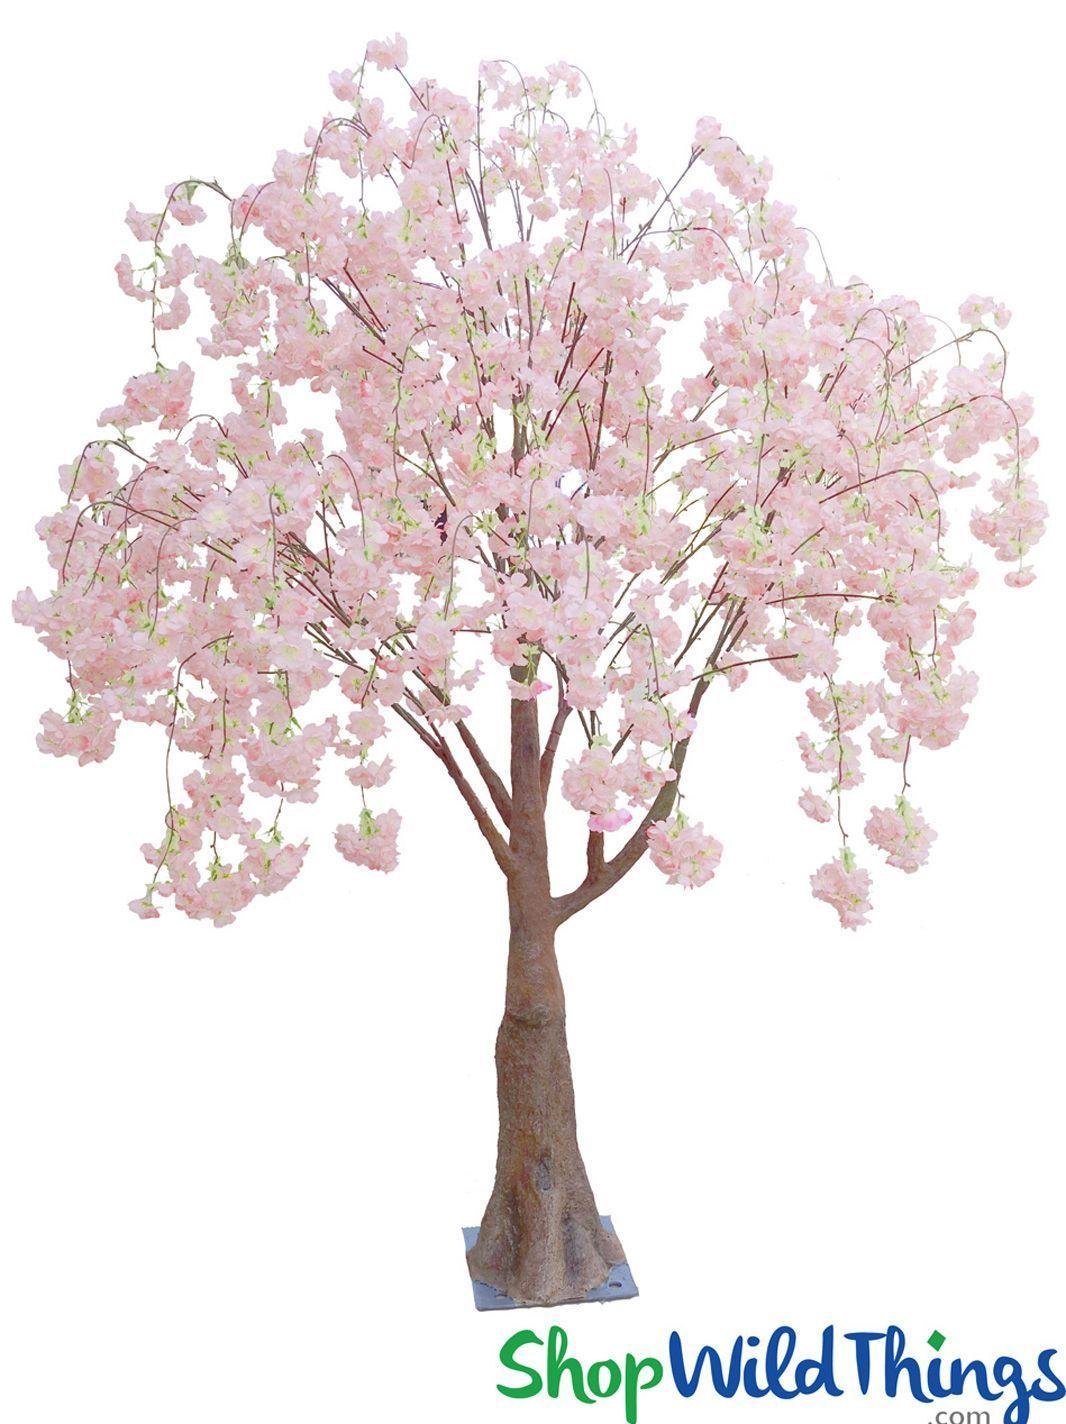 COMING SOON! Flowering Cherry Blossom Tree ExtraFull 6